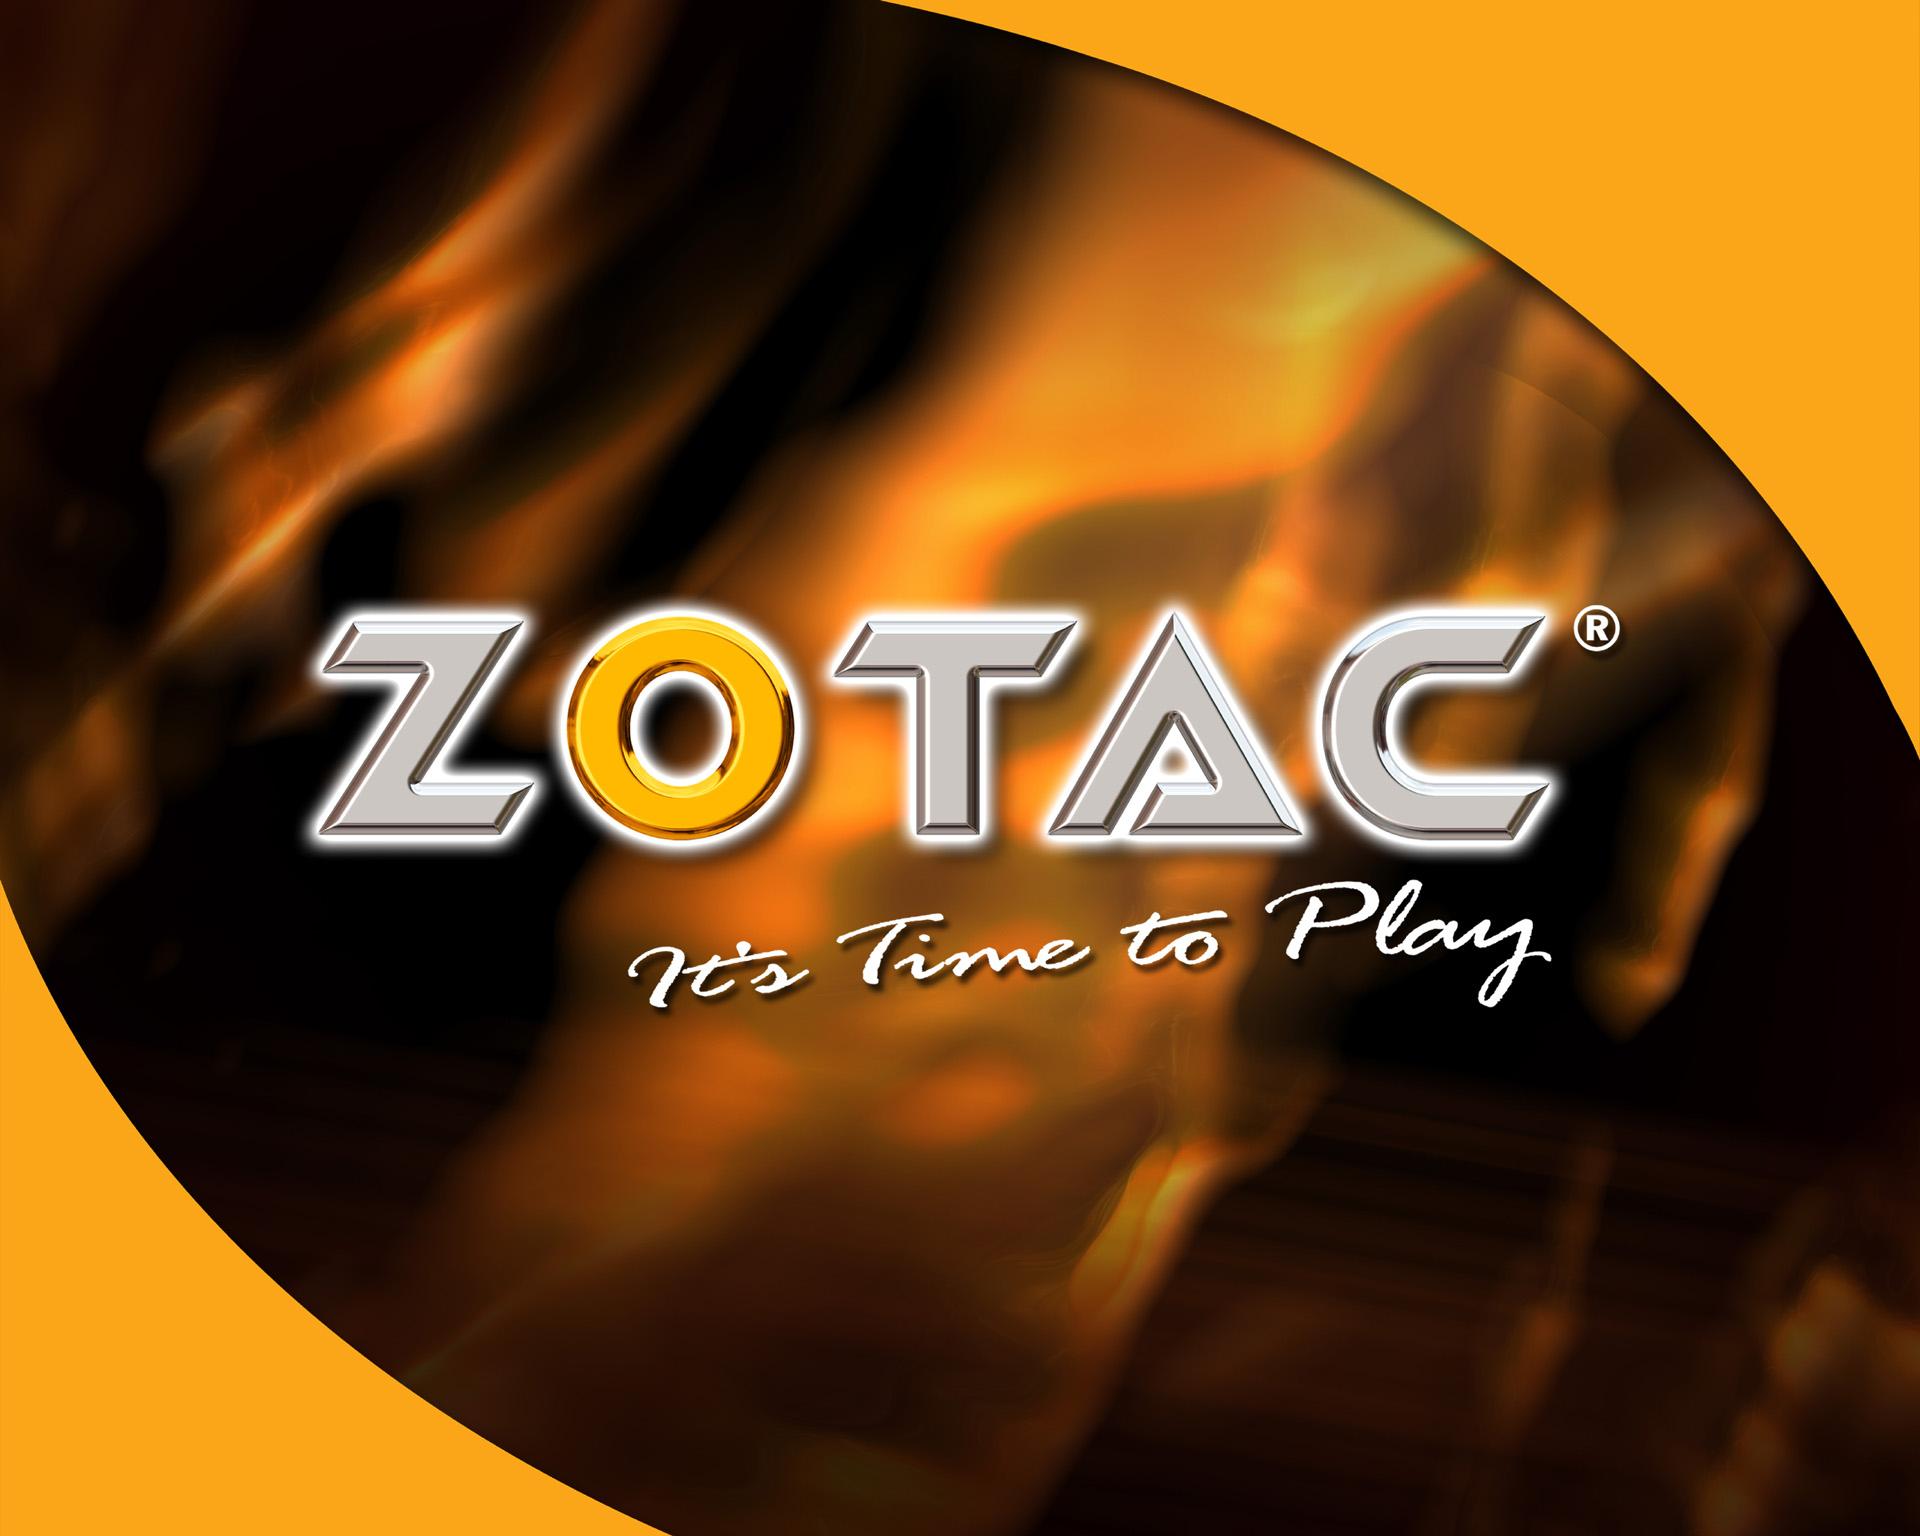 WP-zotac-1920x1536